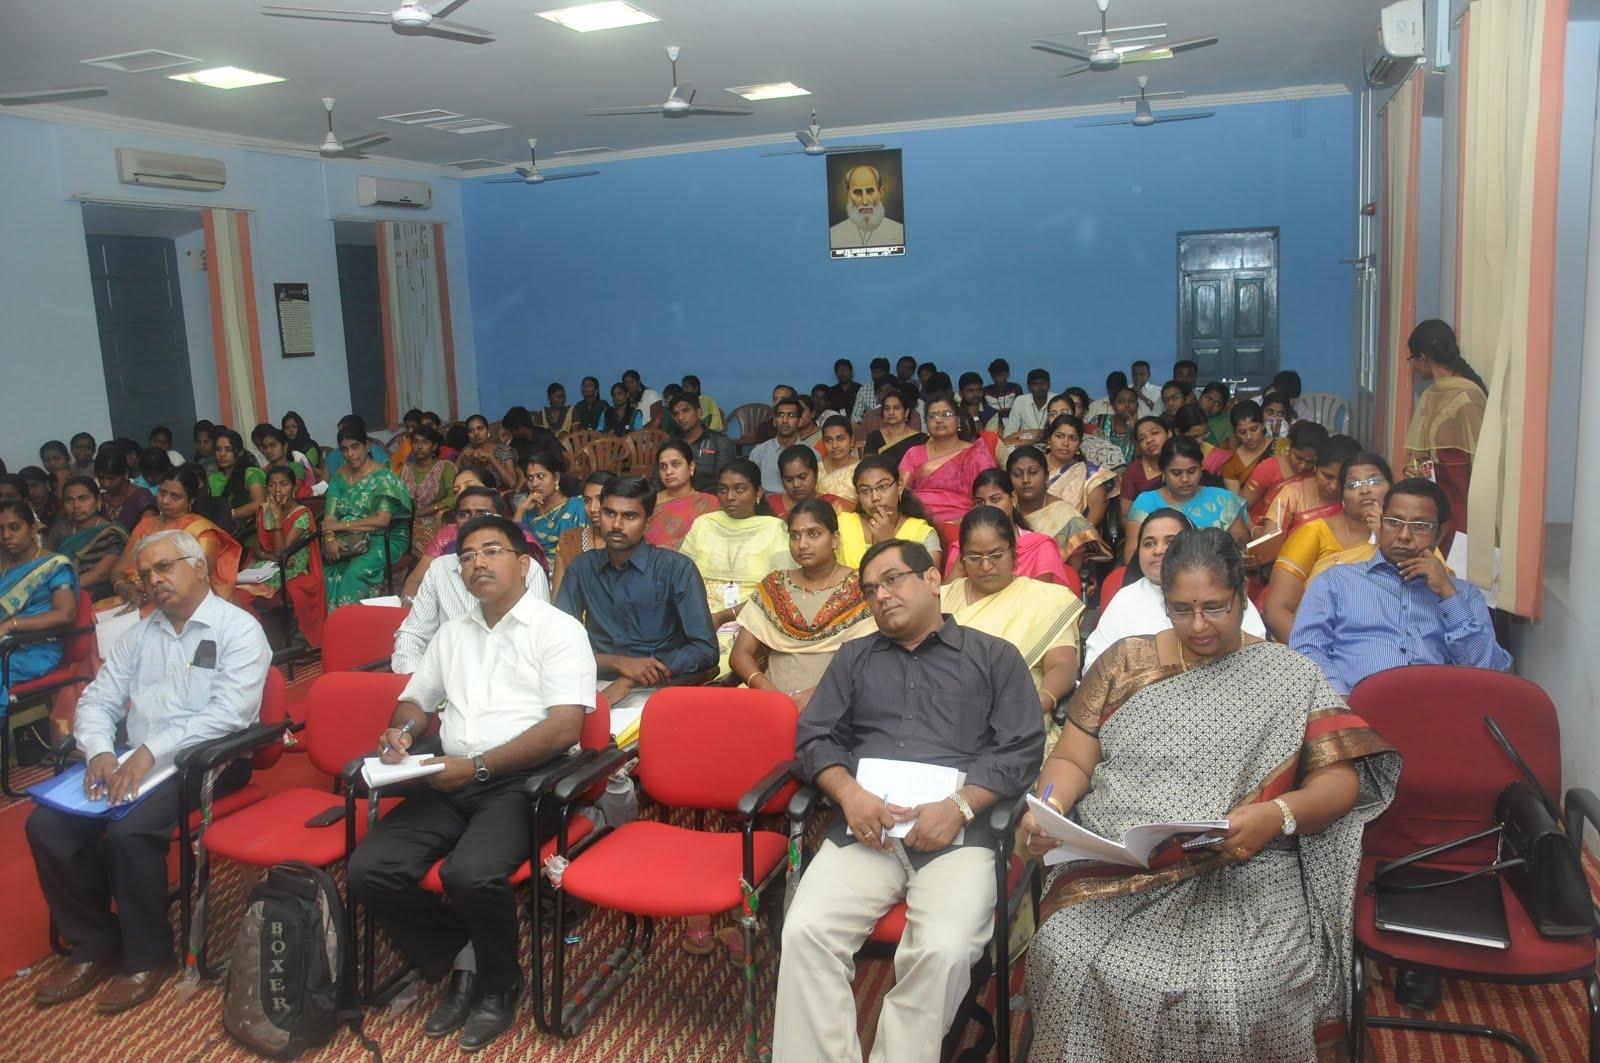 Xavier's College, Palayamkottai